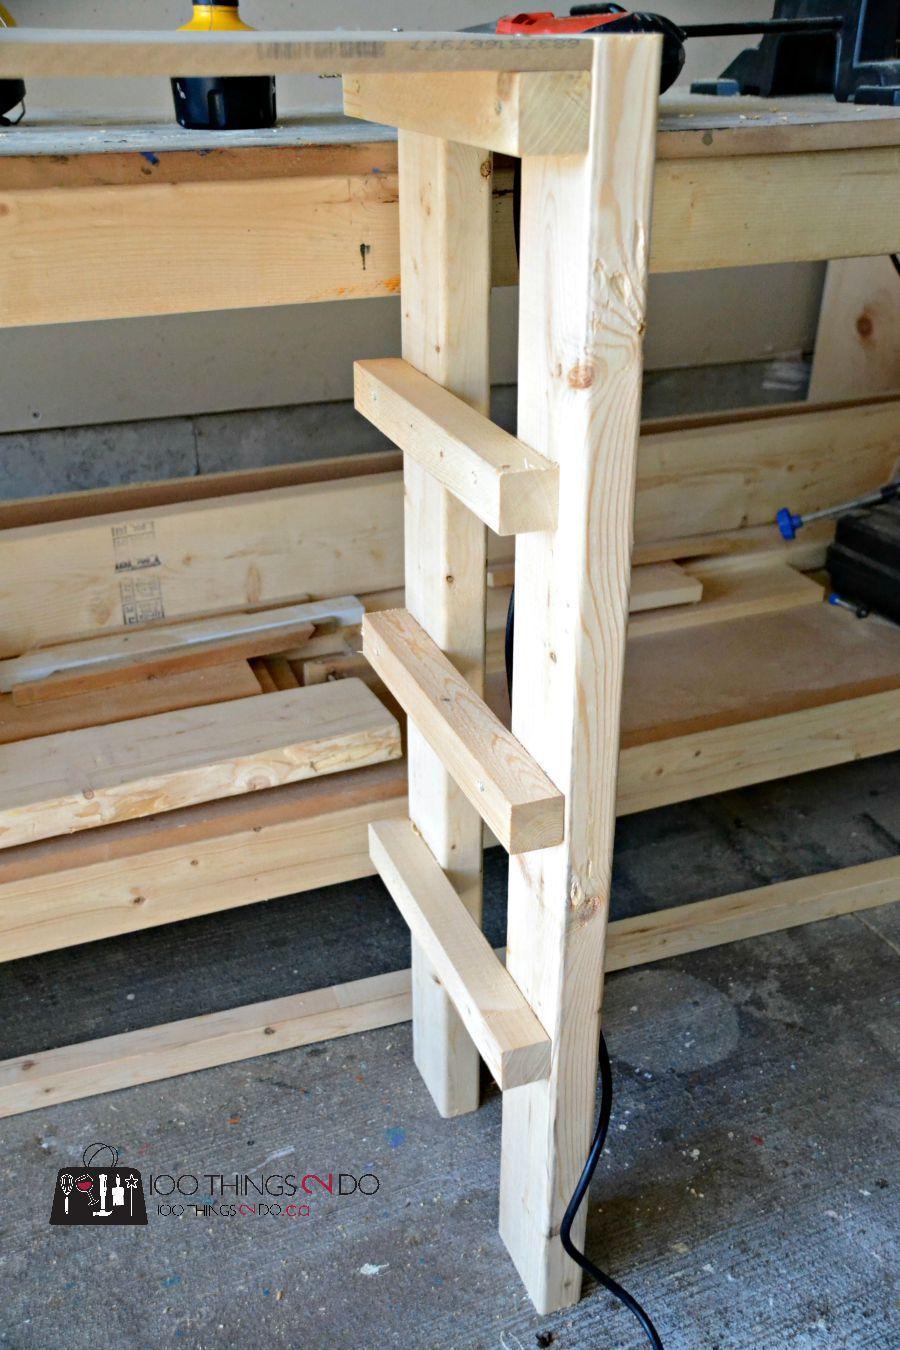 diy shoe rack diy shoe rack wood shoe rack diy shoe on wood shoe rack diy simple id=69863